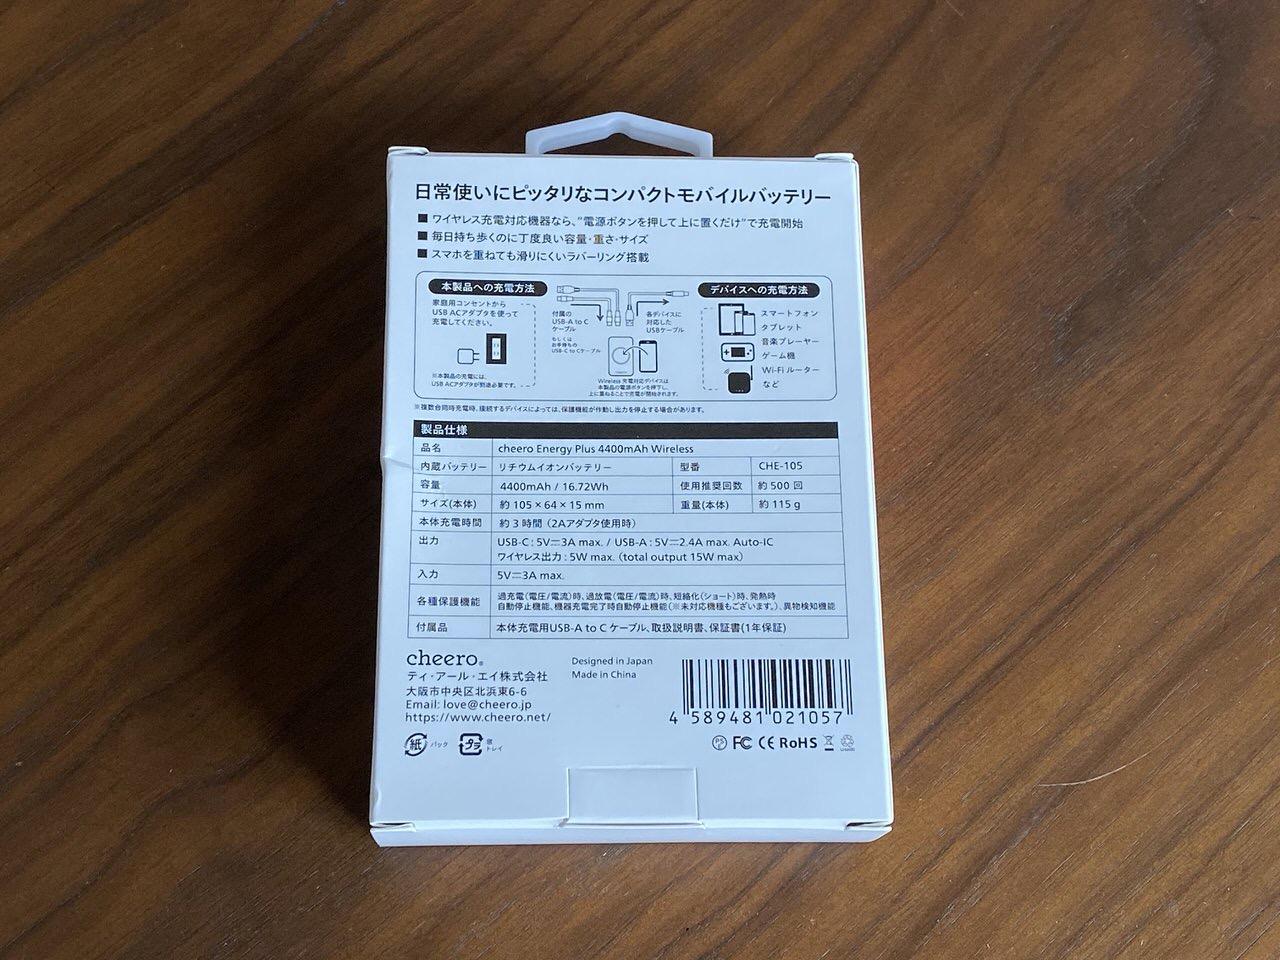 「cheero Energy Plus mini Wireless 4400mAh」2